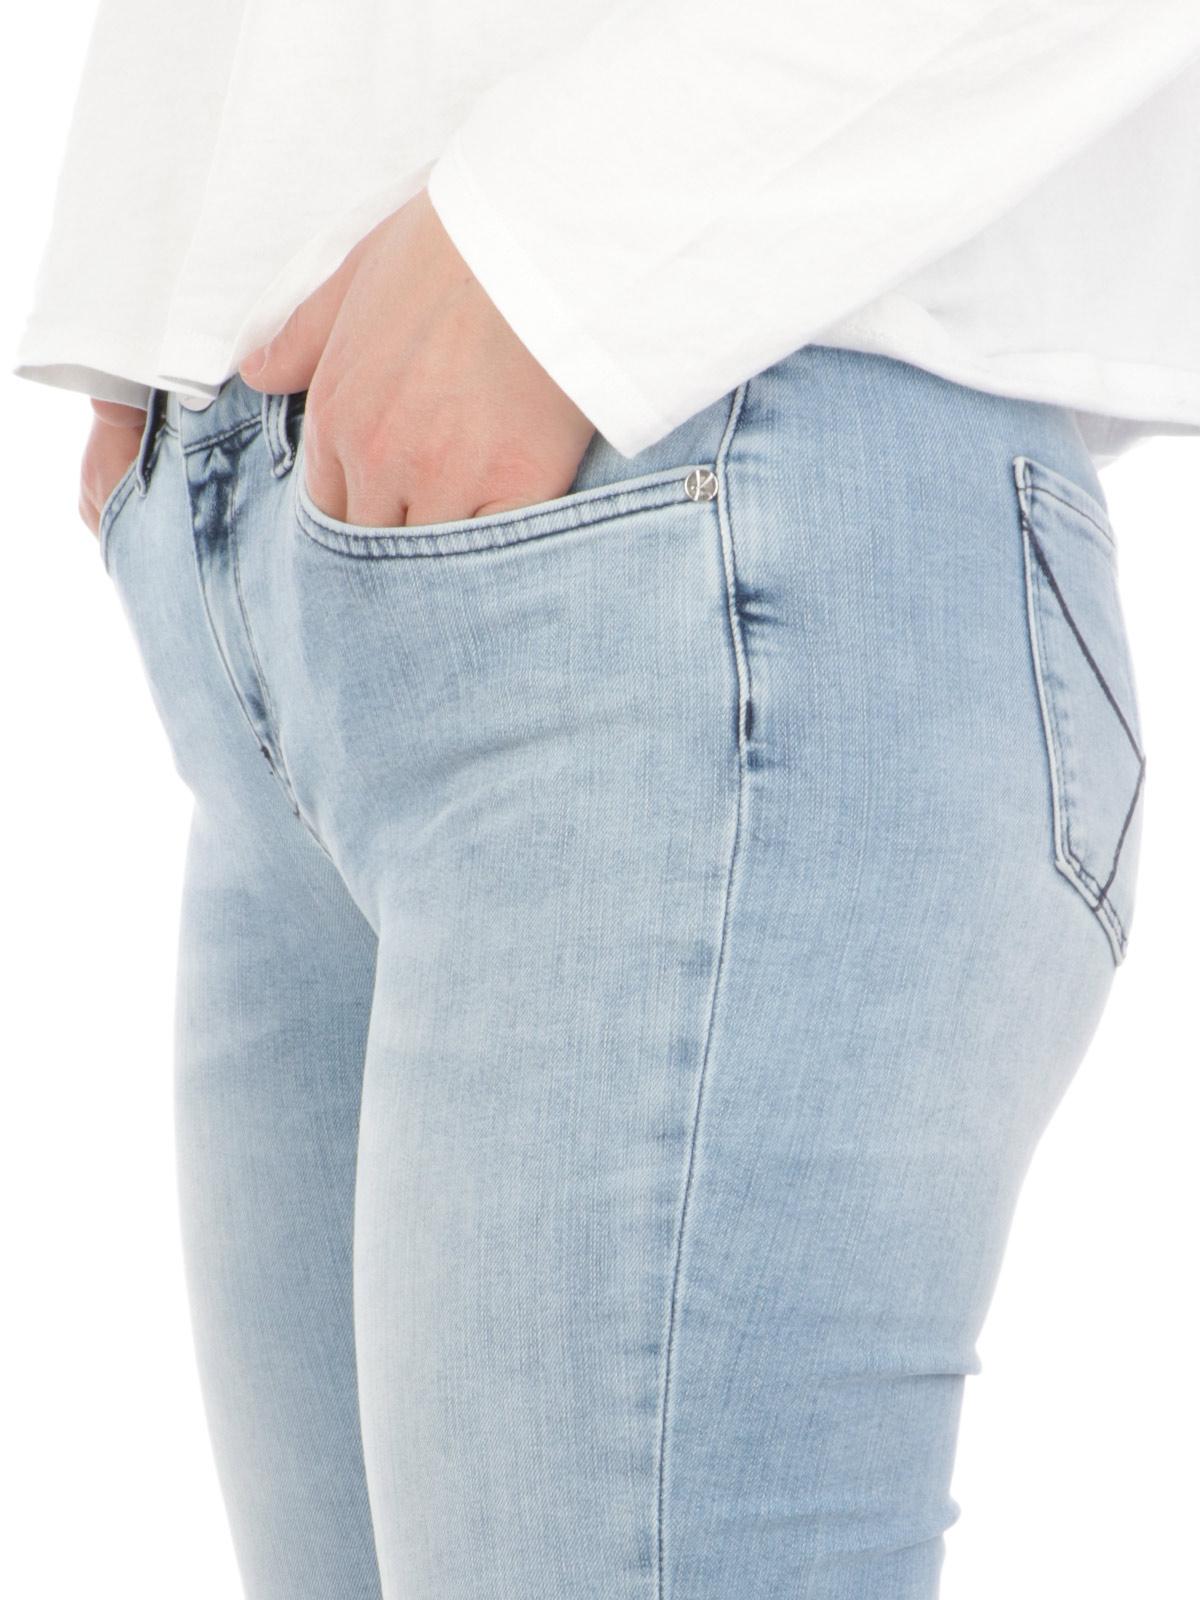 Immagine di Kaos   Trousers Pantalone